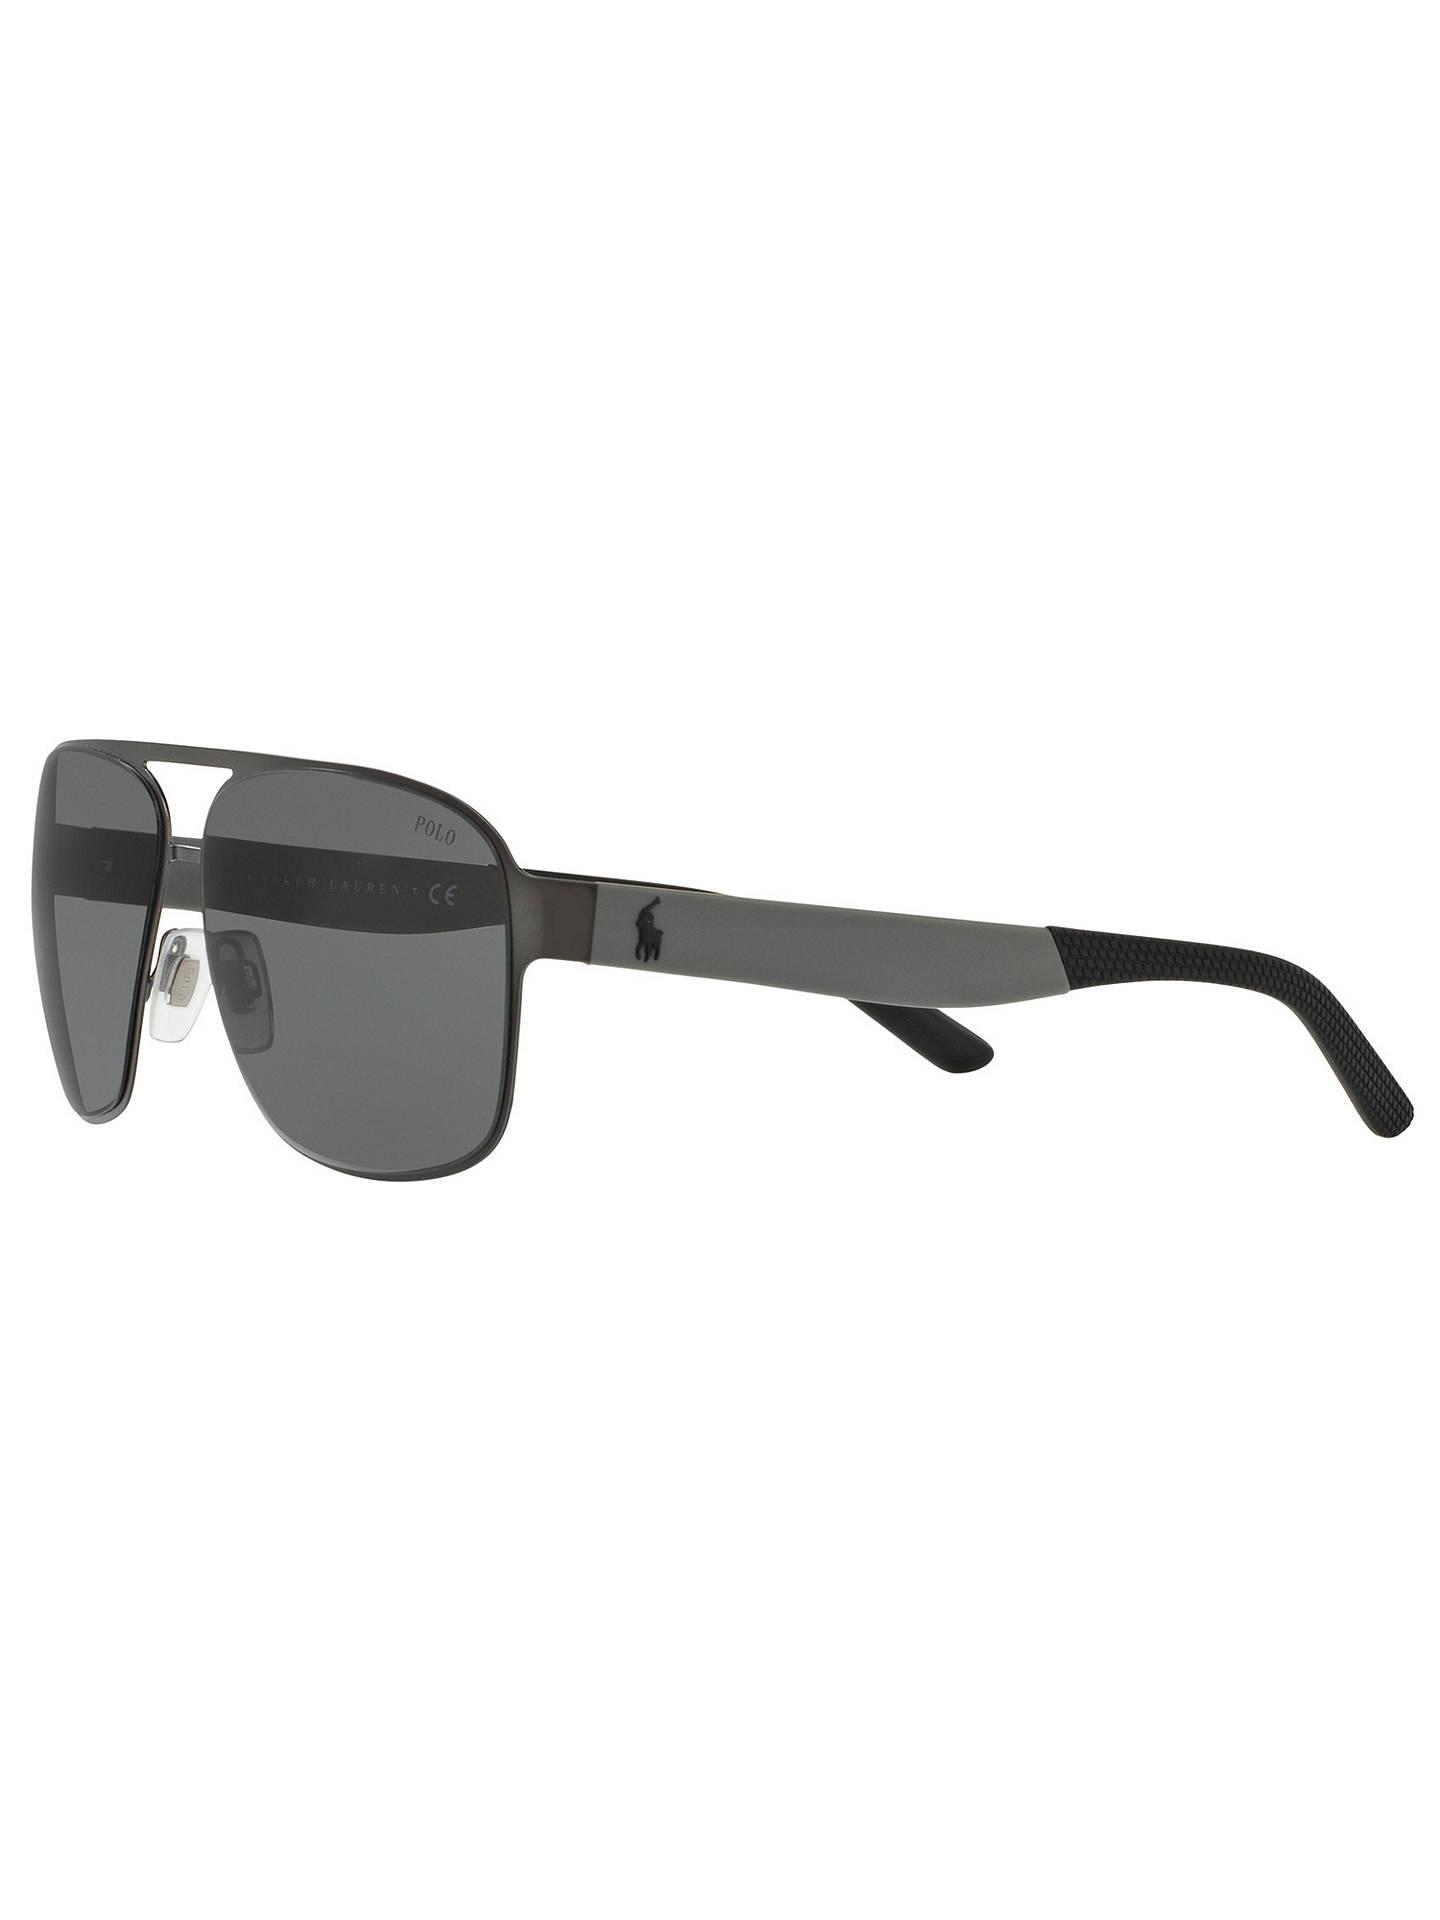 8b78d0172dc0 ... sweden buypolo ralph lauren ph3105 mens square sunglasses charcoal grey  online at johnlewis. 788c2 f5342